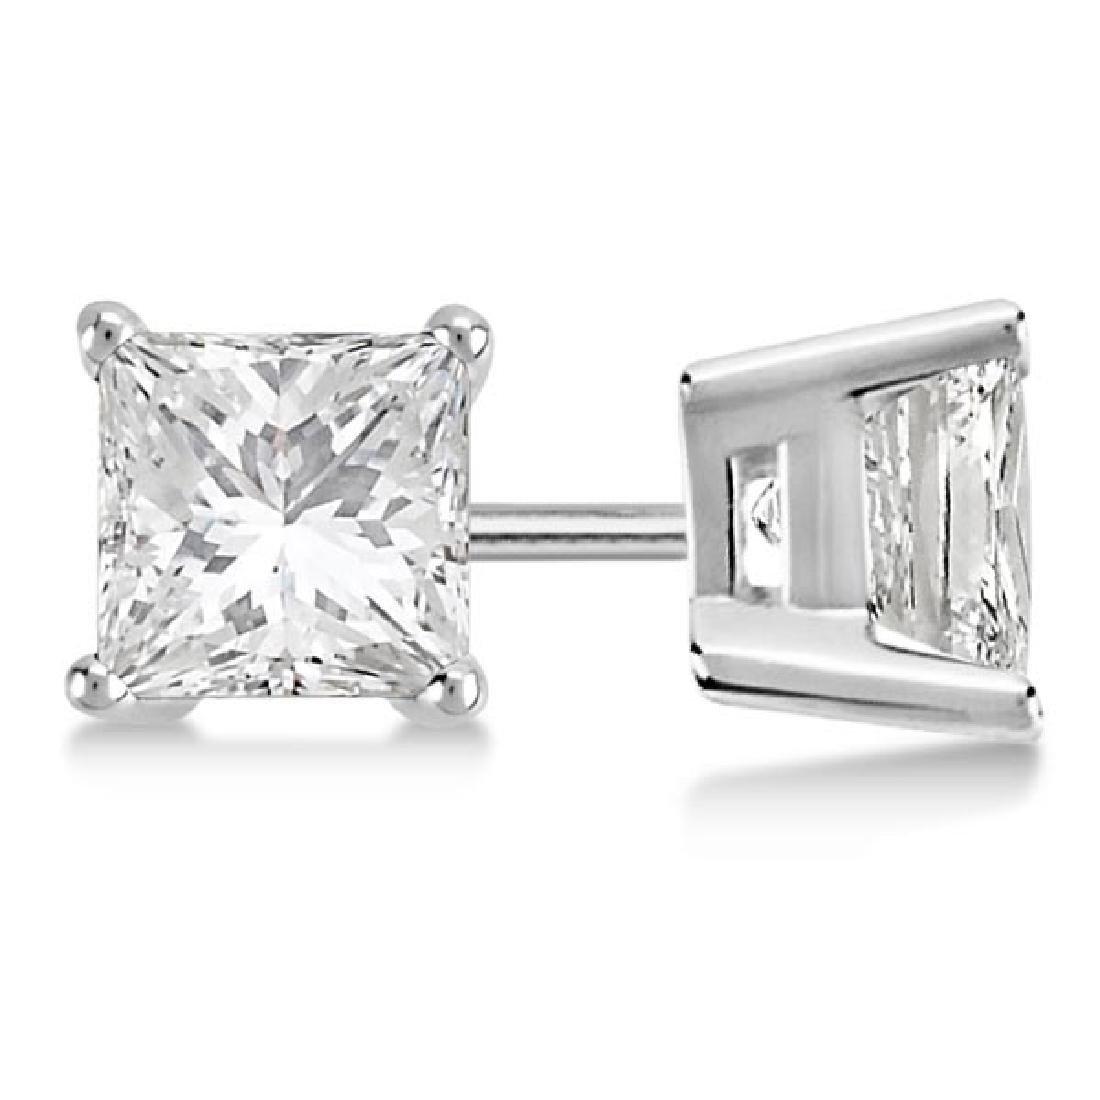 Certified 0.97 CTW Princess Diamond Stud Earrings H/SI2